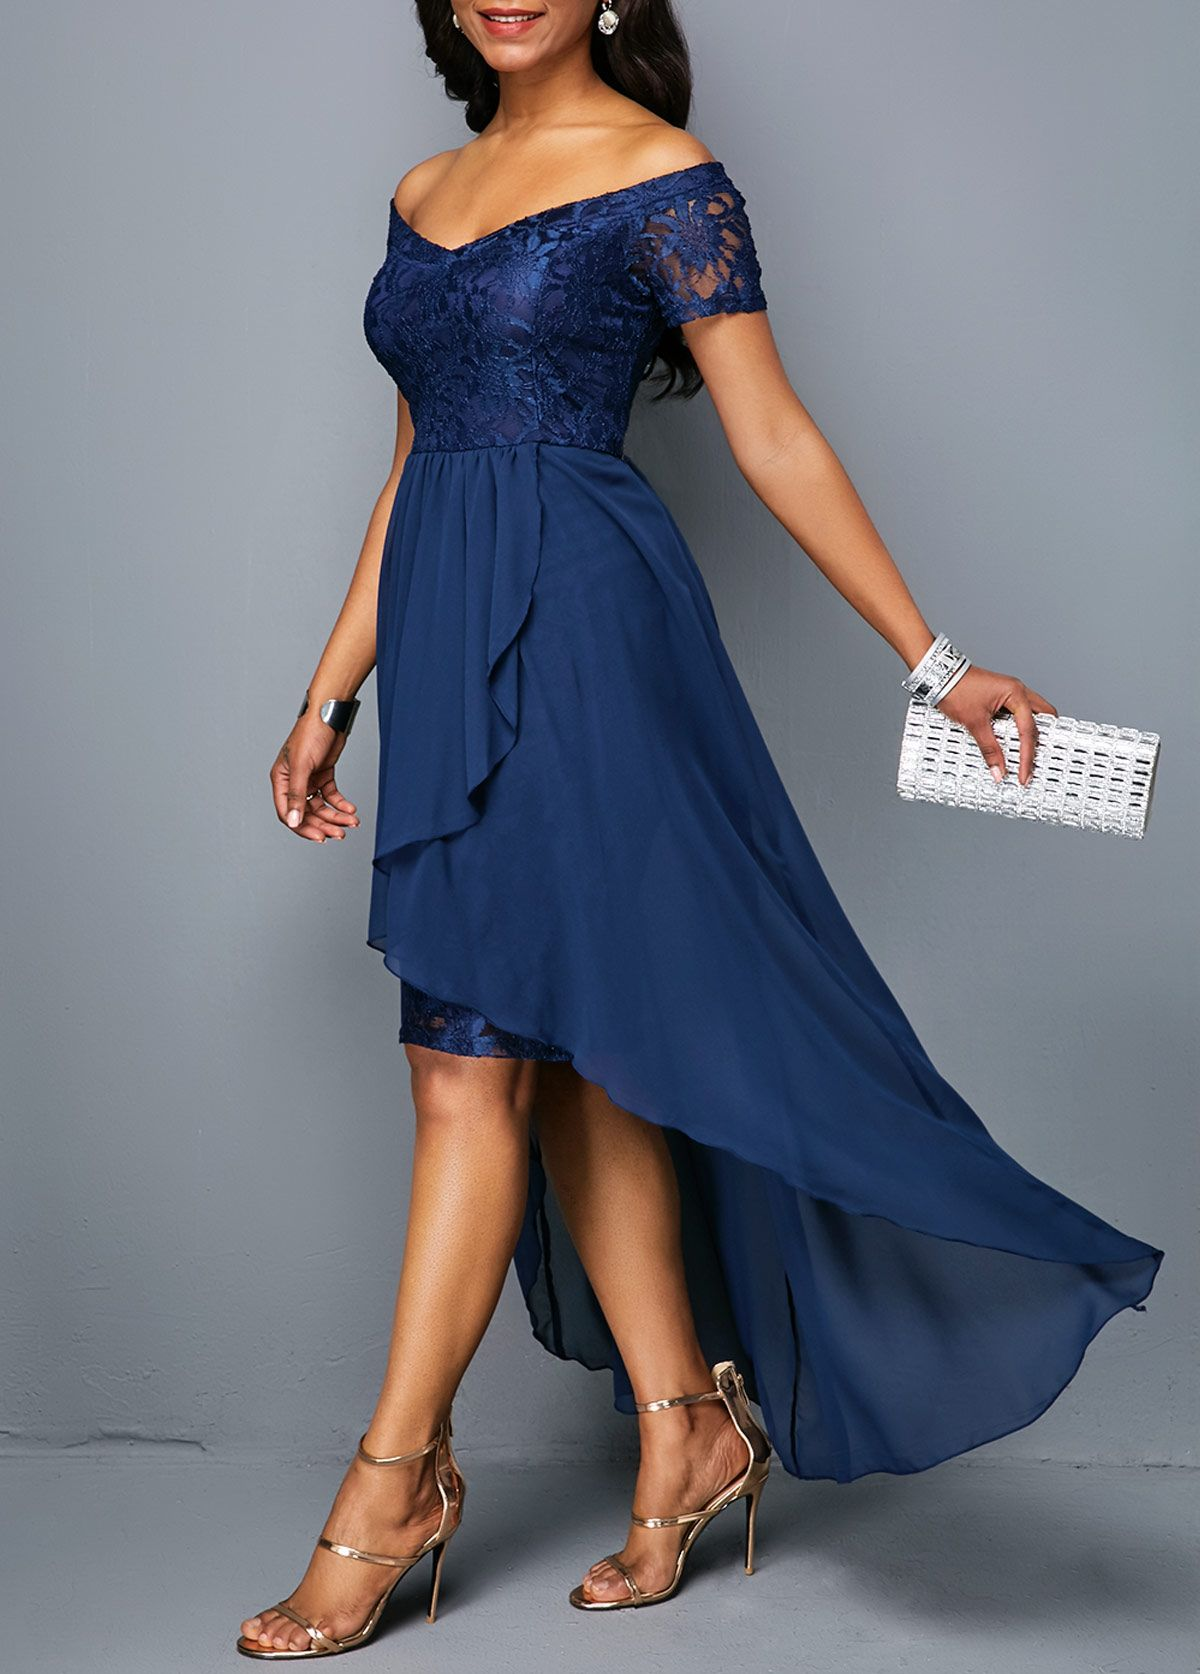 Short Sleeve Off The Shoulder High Low Dress Rotita Com Usd 34 98 Dresses Fashion Dresses Online Women S Fashion Dresses [ 1674 x 1200 Pixel ]